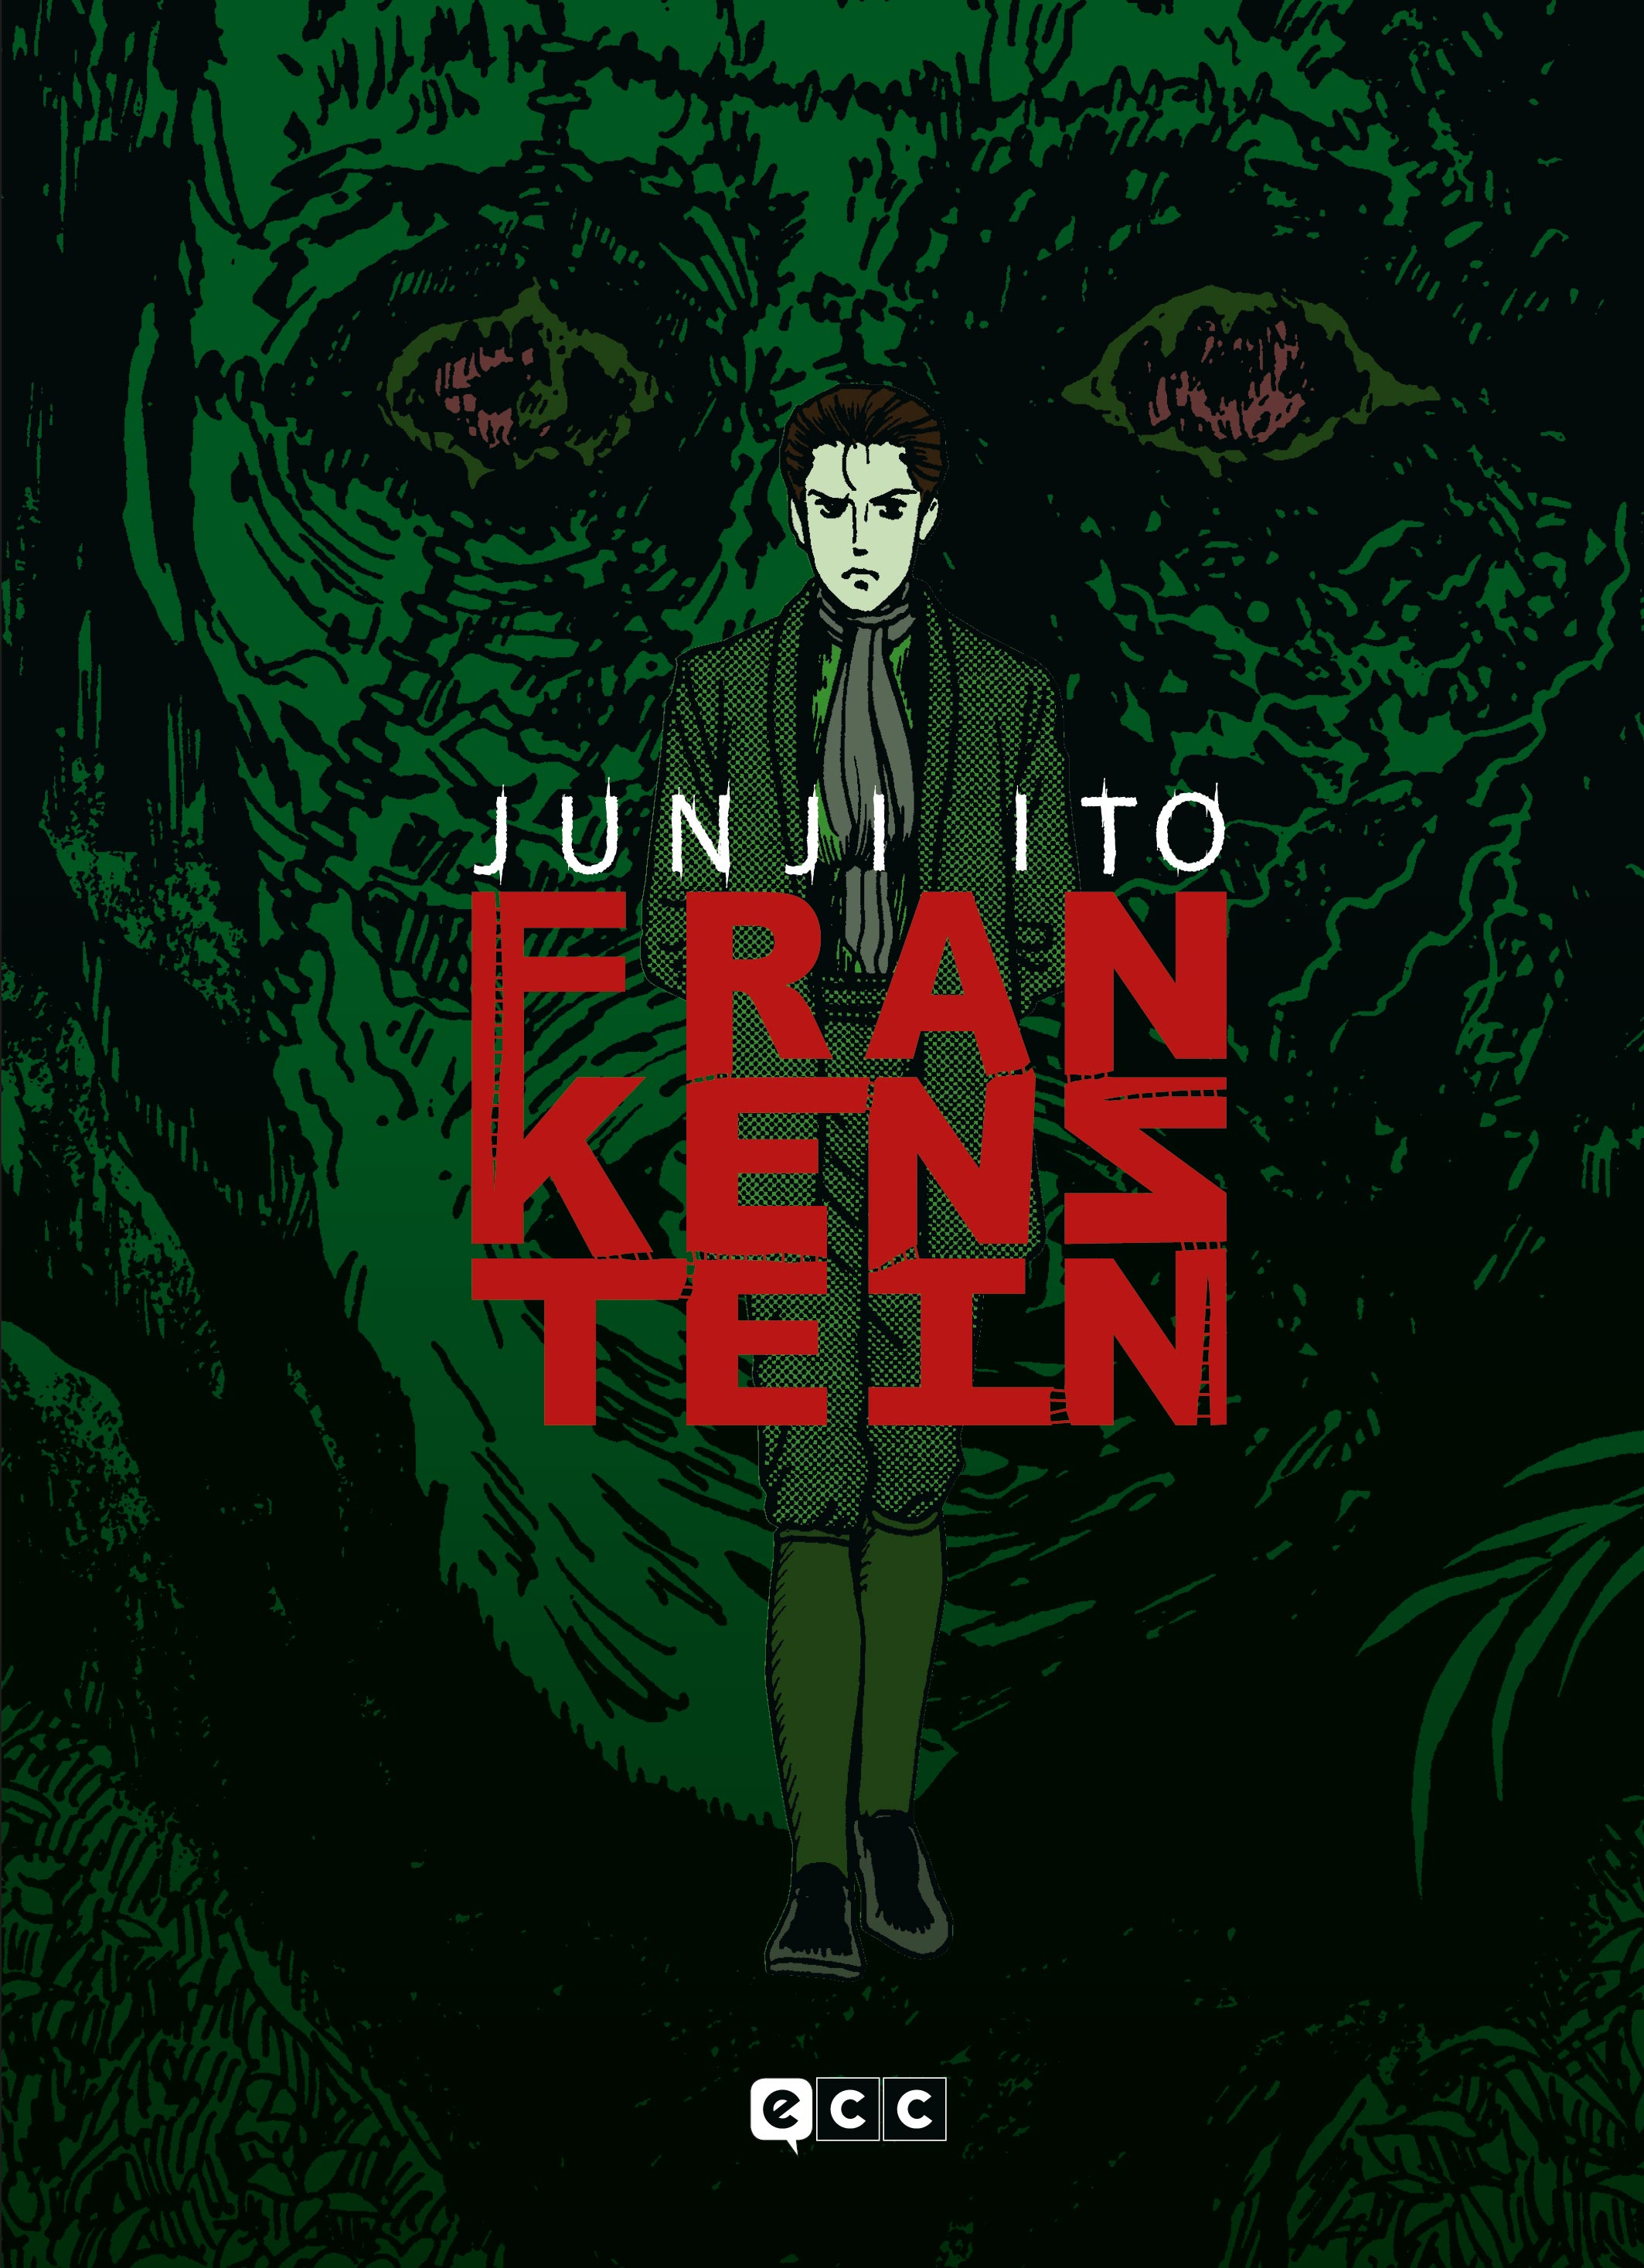 Junji Ito - Frankenstein